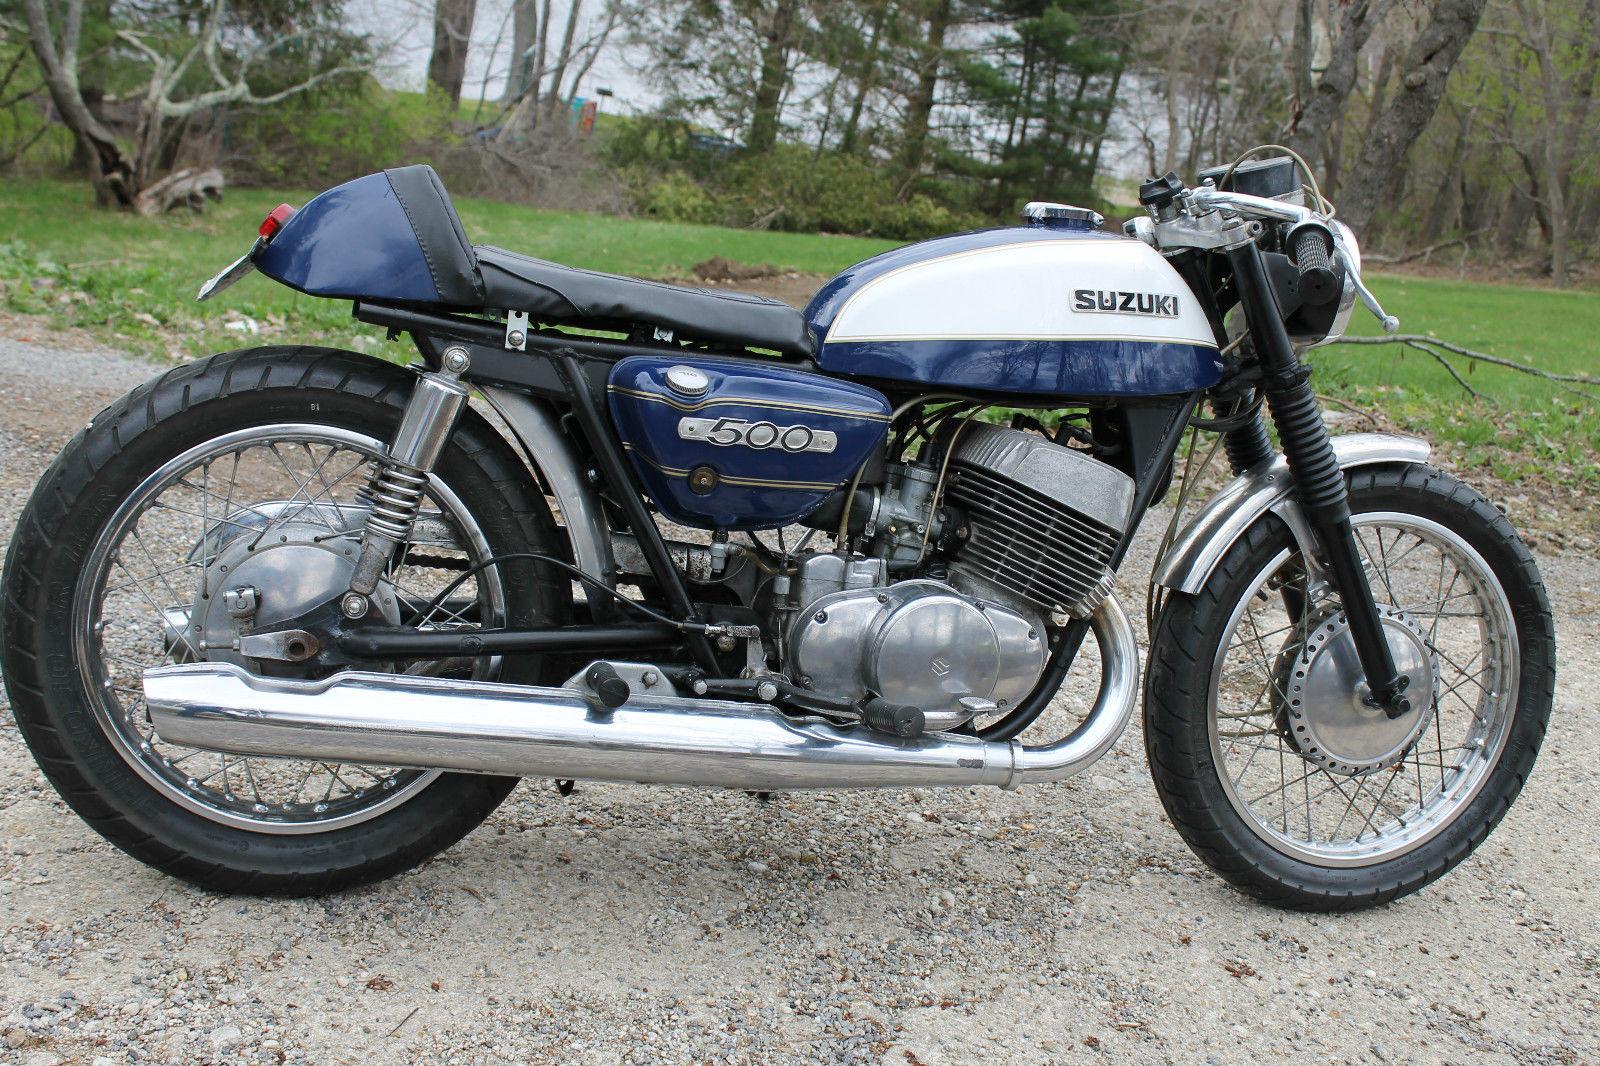 1971 suzuki t500 cafe racer | bike-urious